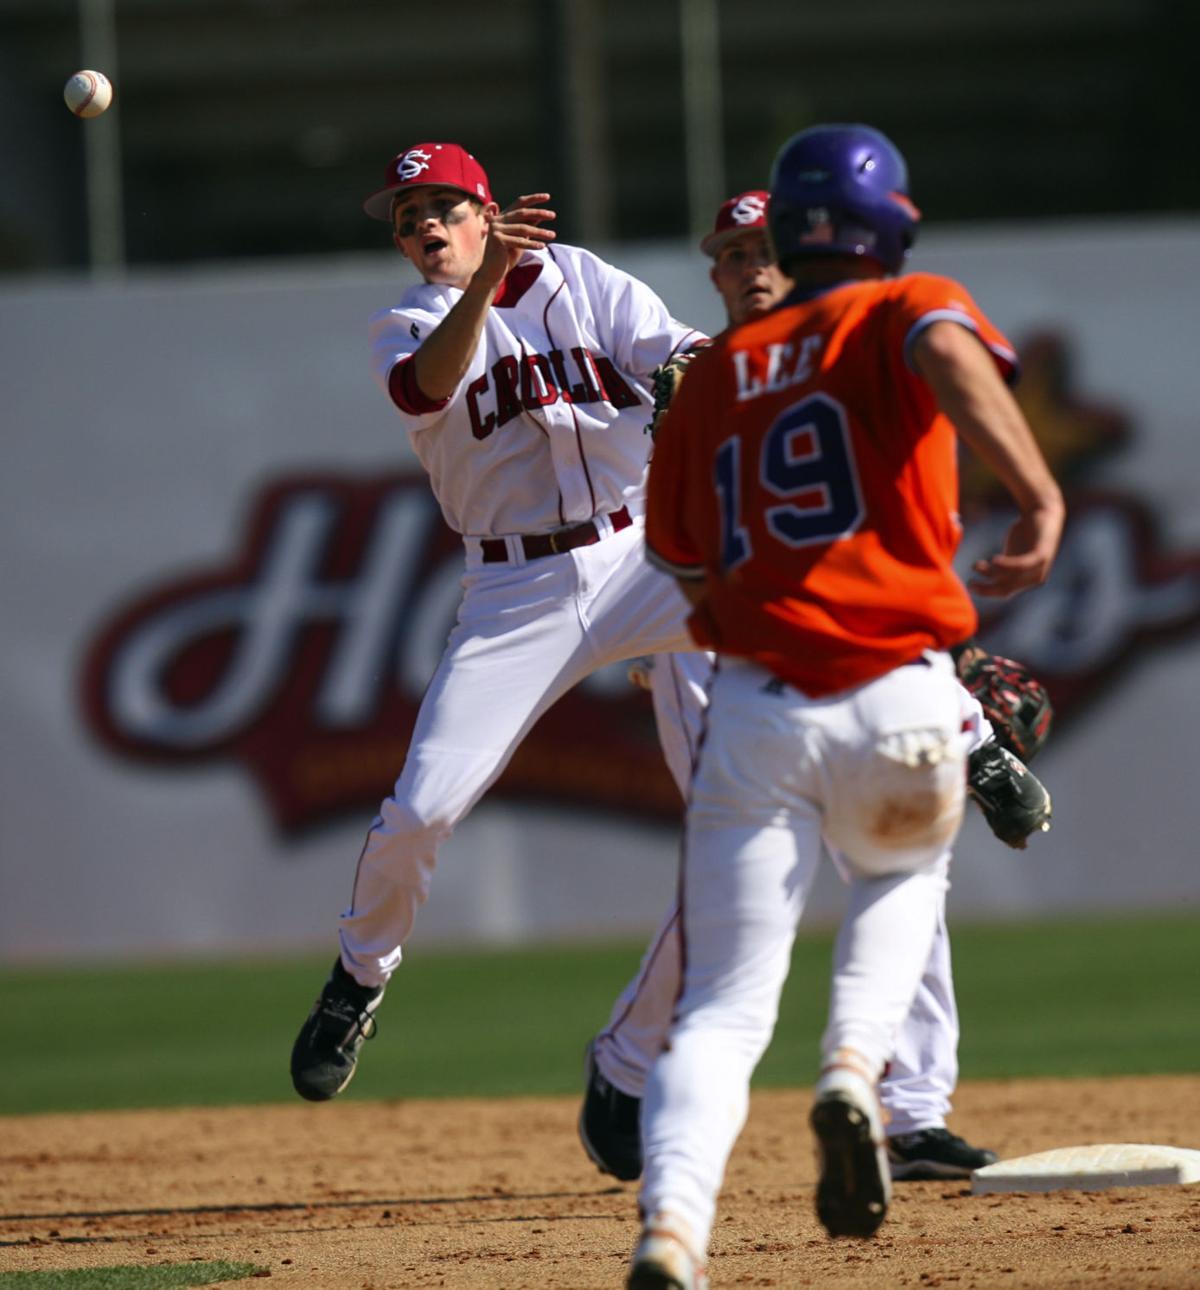 Charleston Baseball Hall of Fame seeks nominations